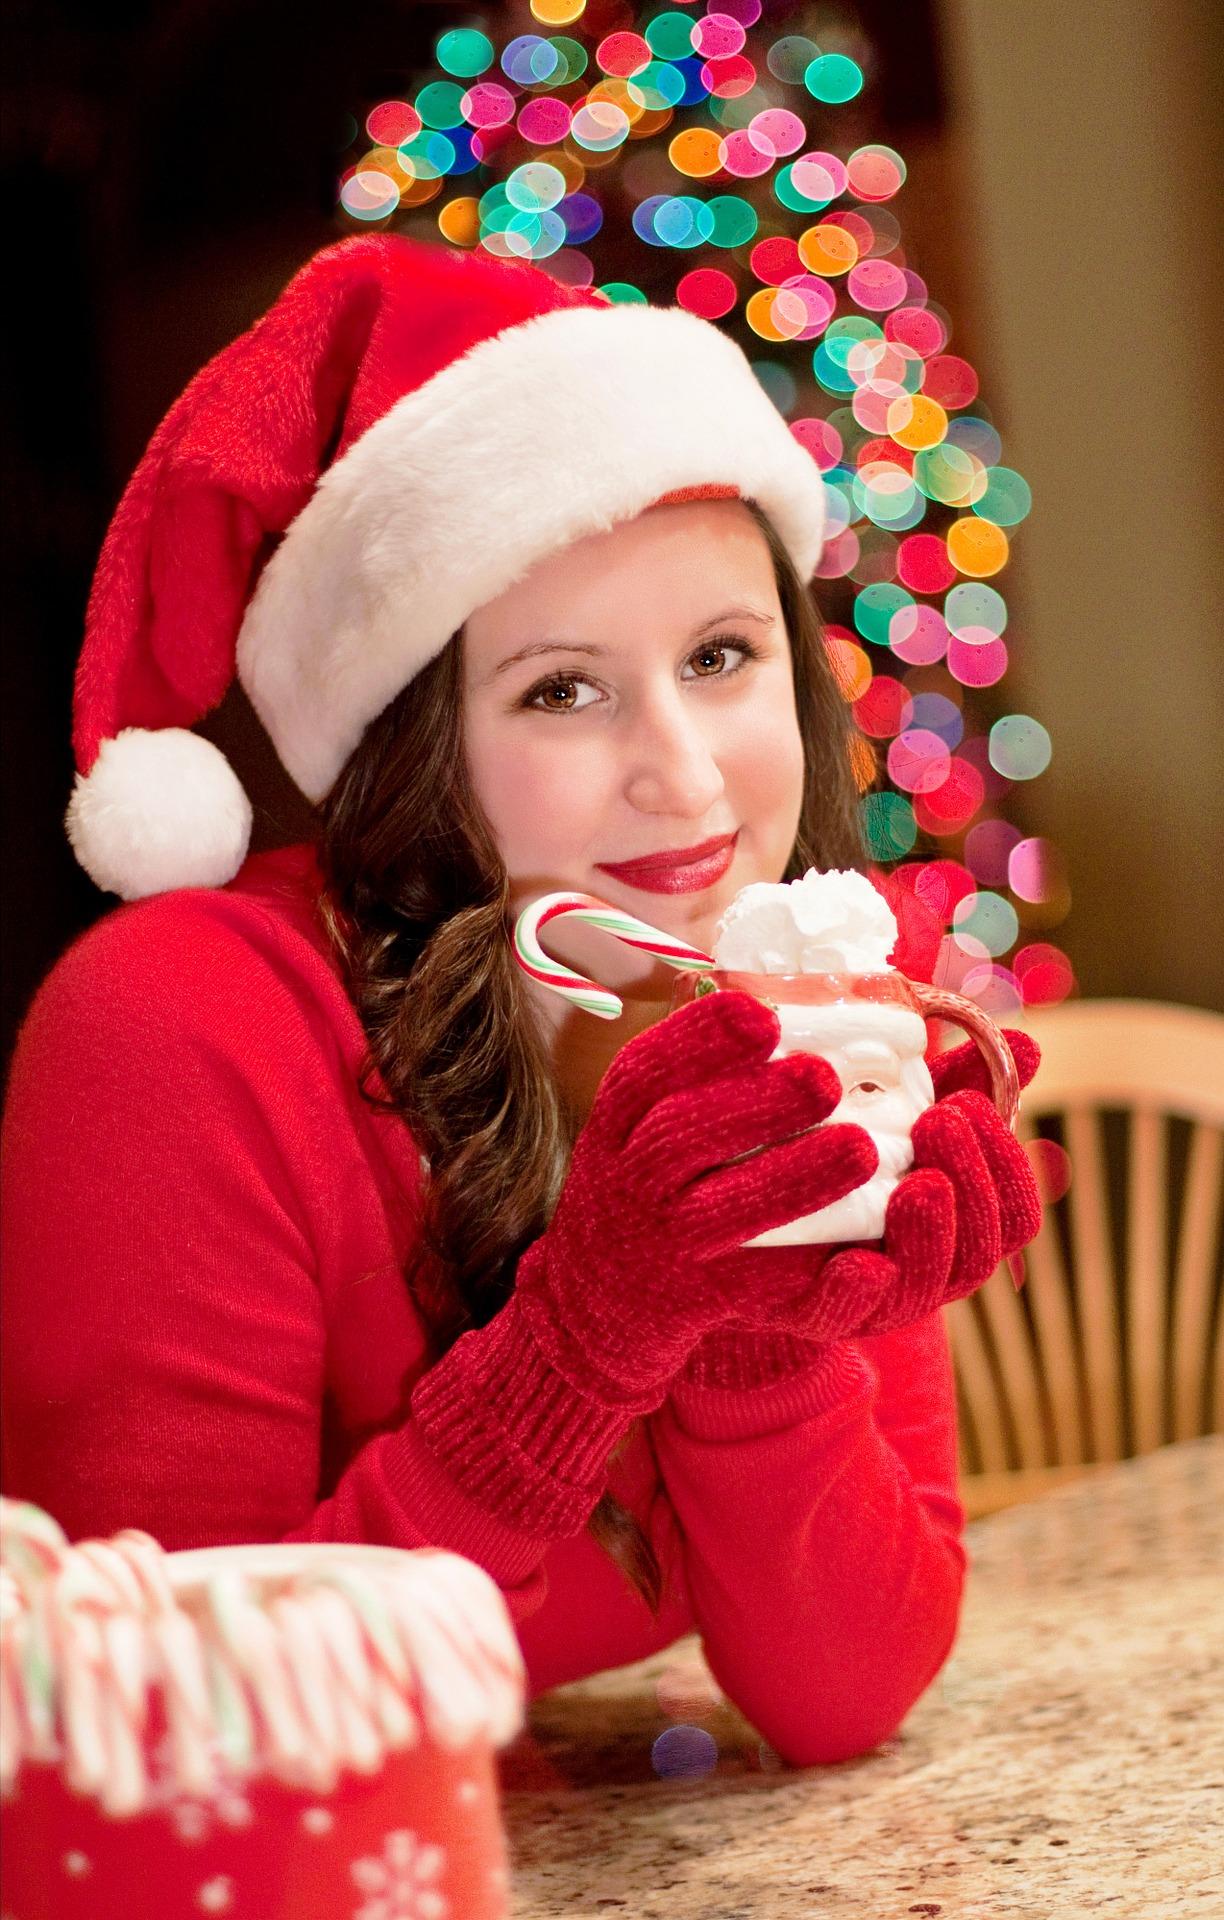 Santa Woman, Christmas, Christmastree, Claus, Lady, HQ Photo